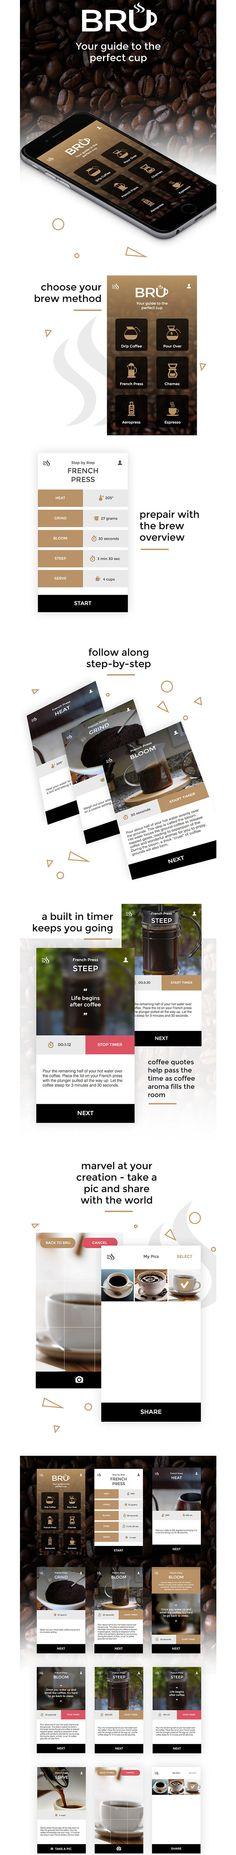 BRU - App for making coffee